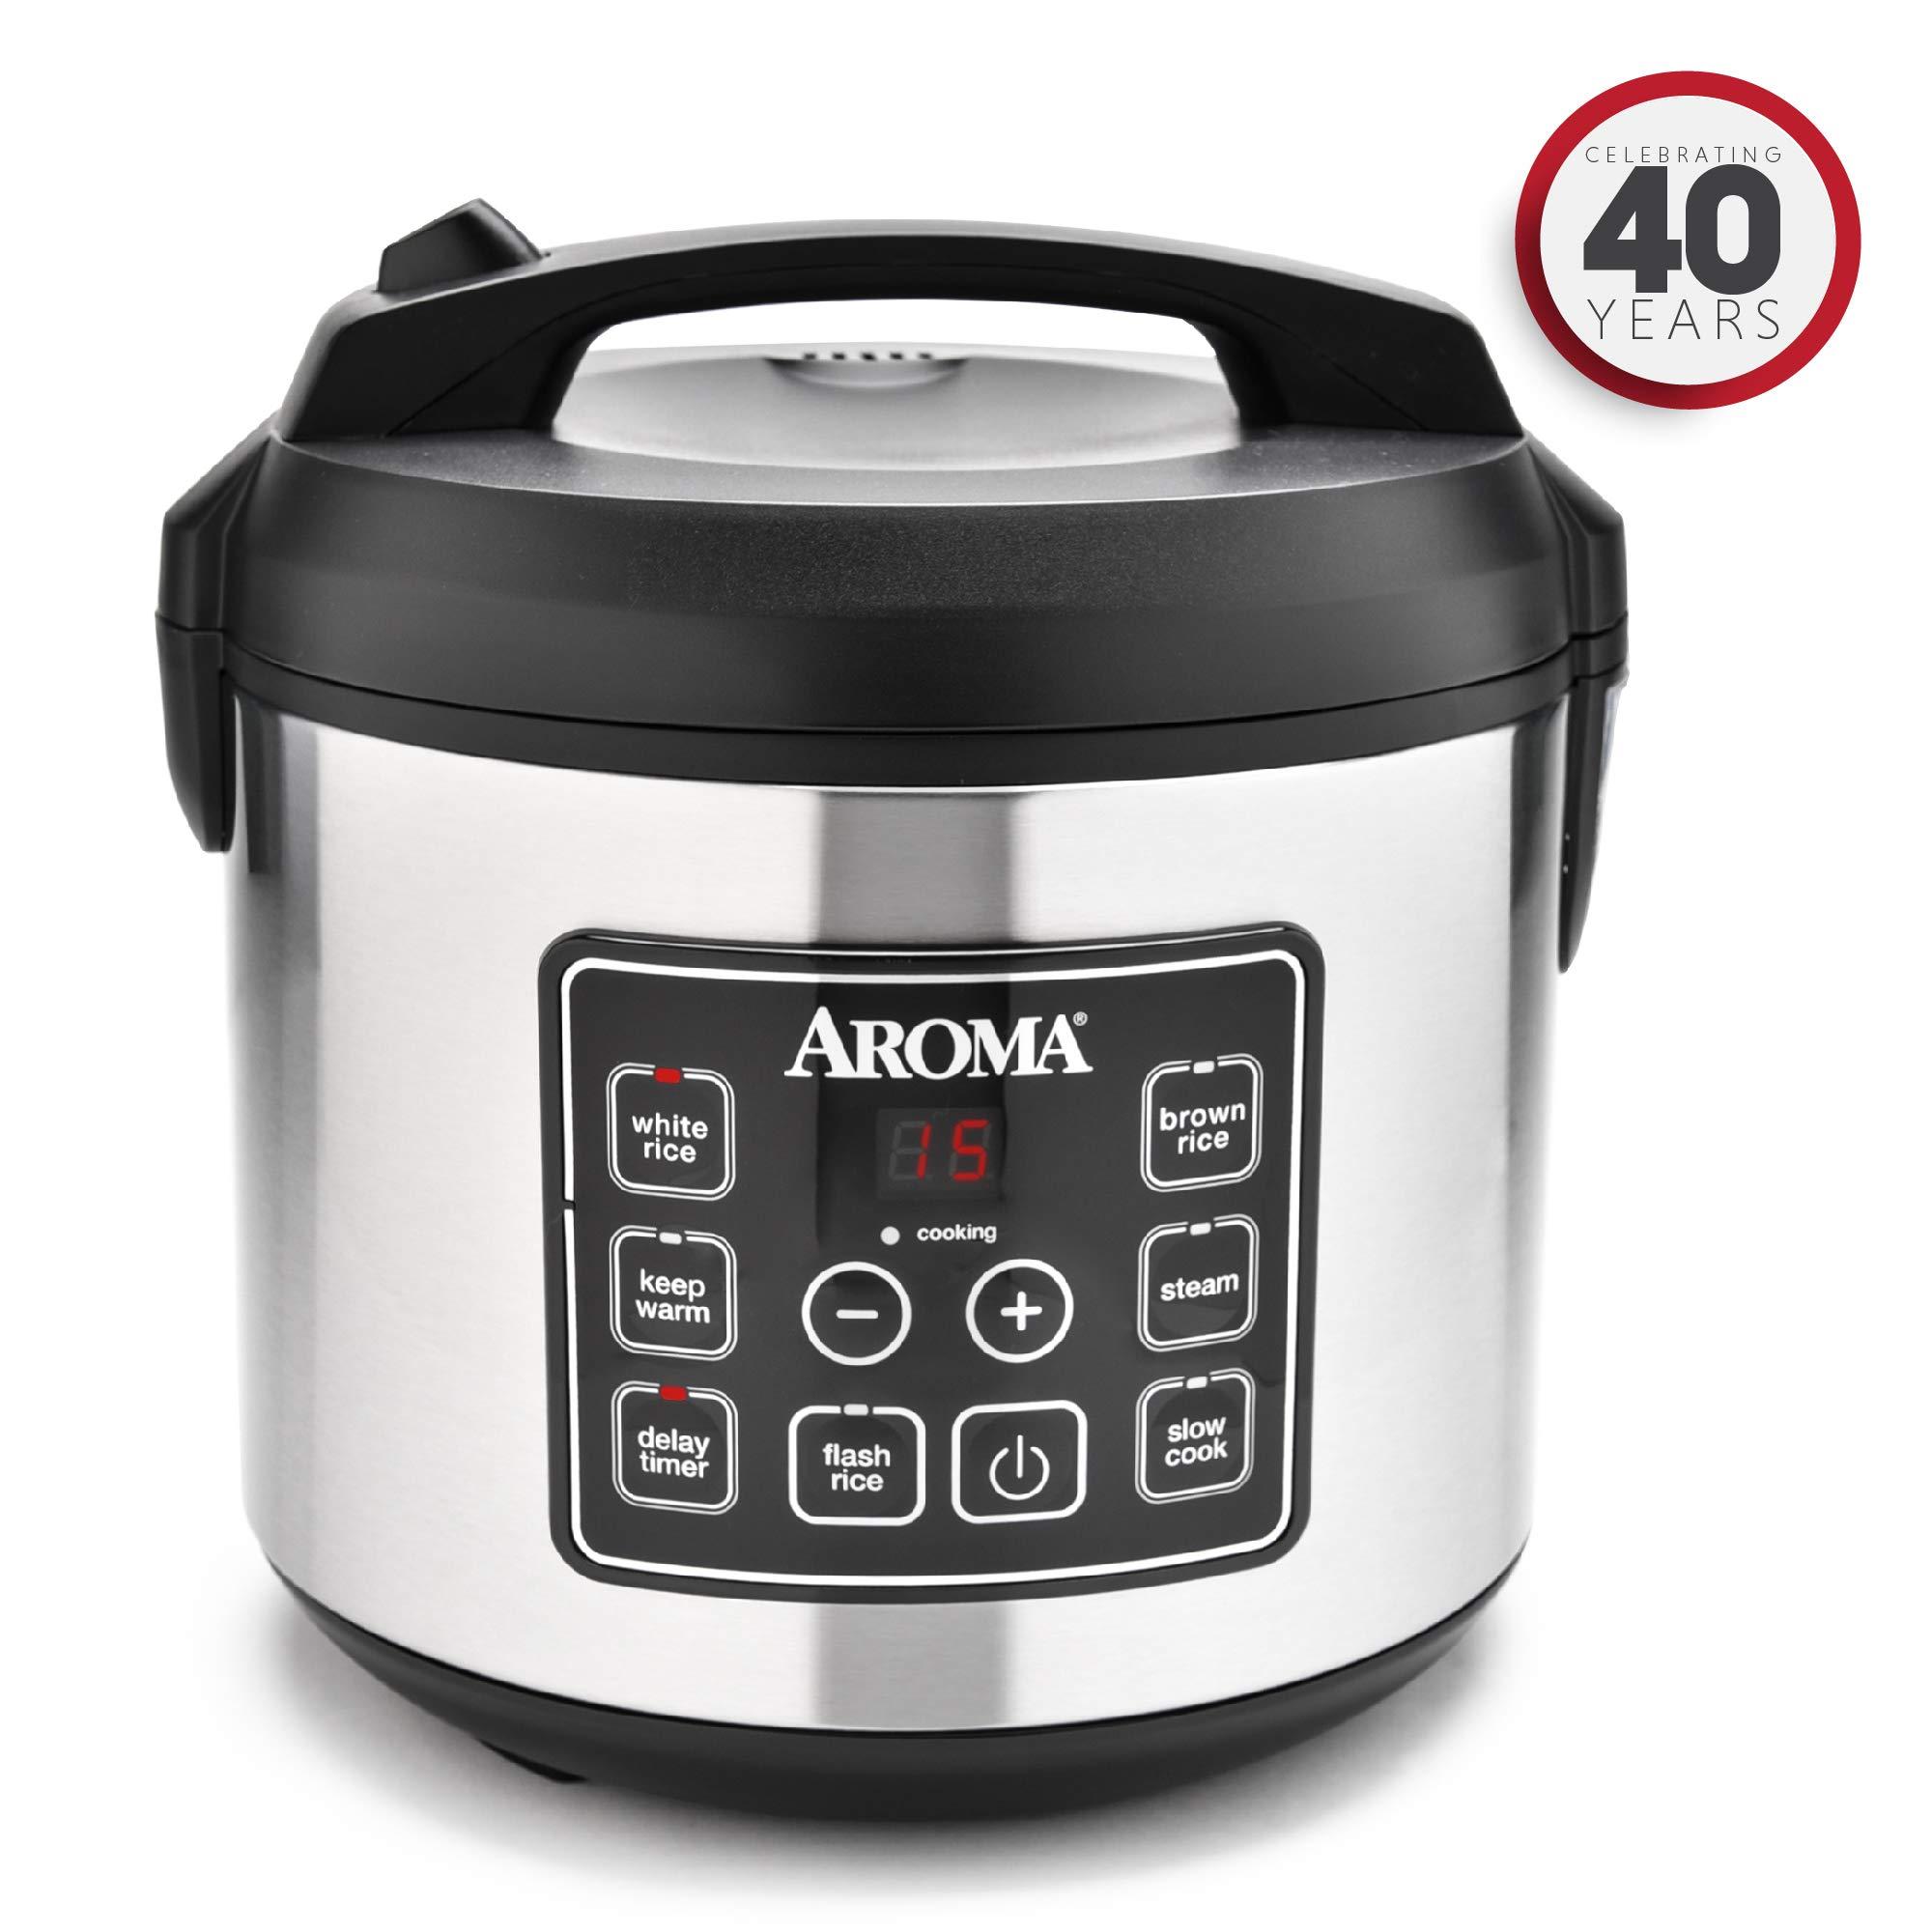 Aroma Housewares uncooked Exterior ARC 150SB